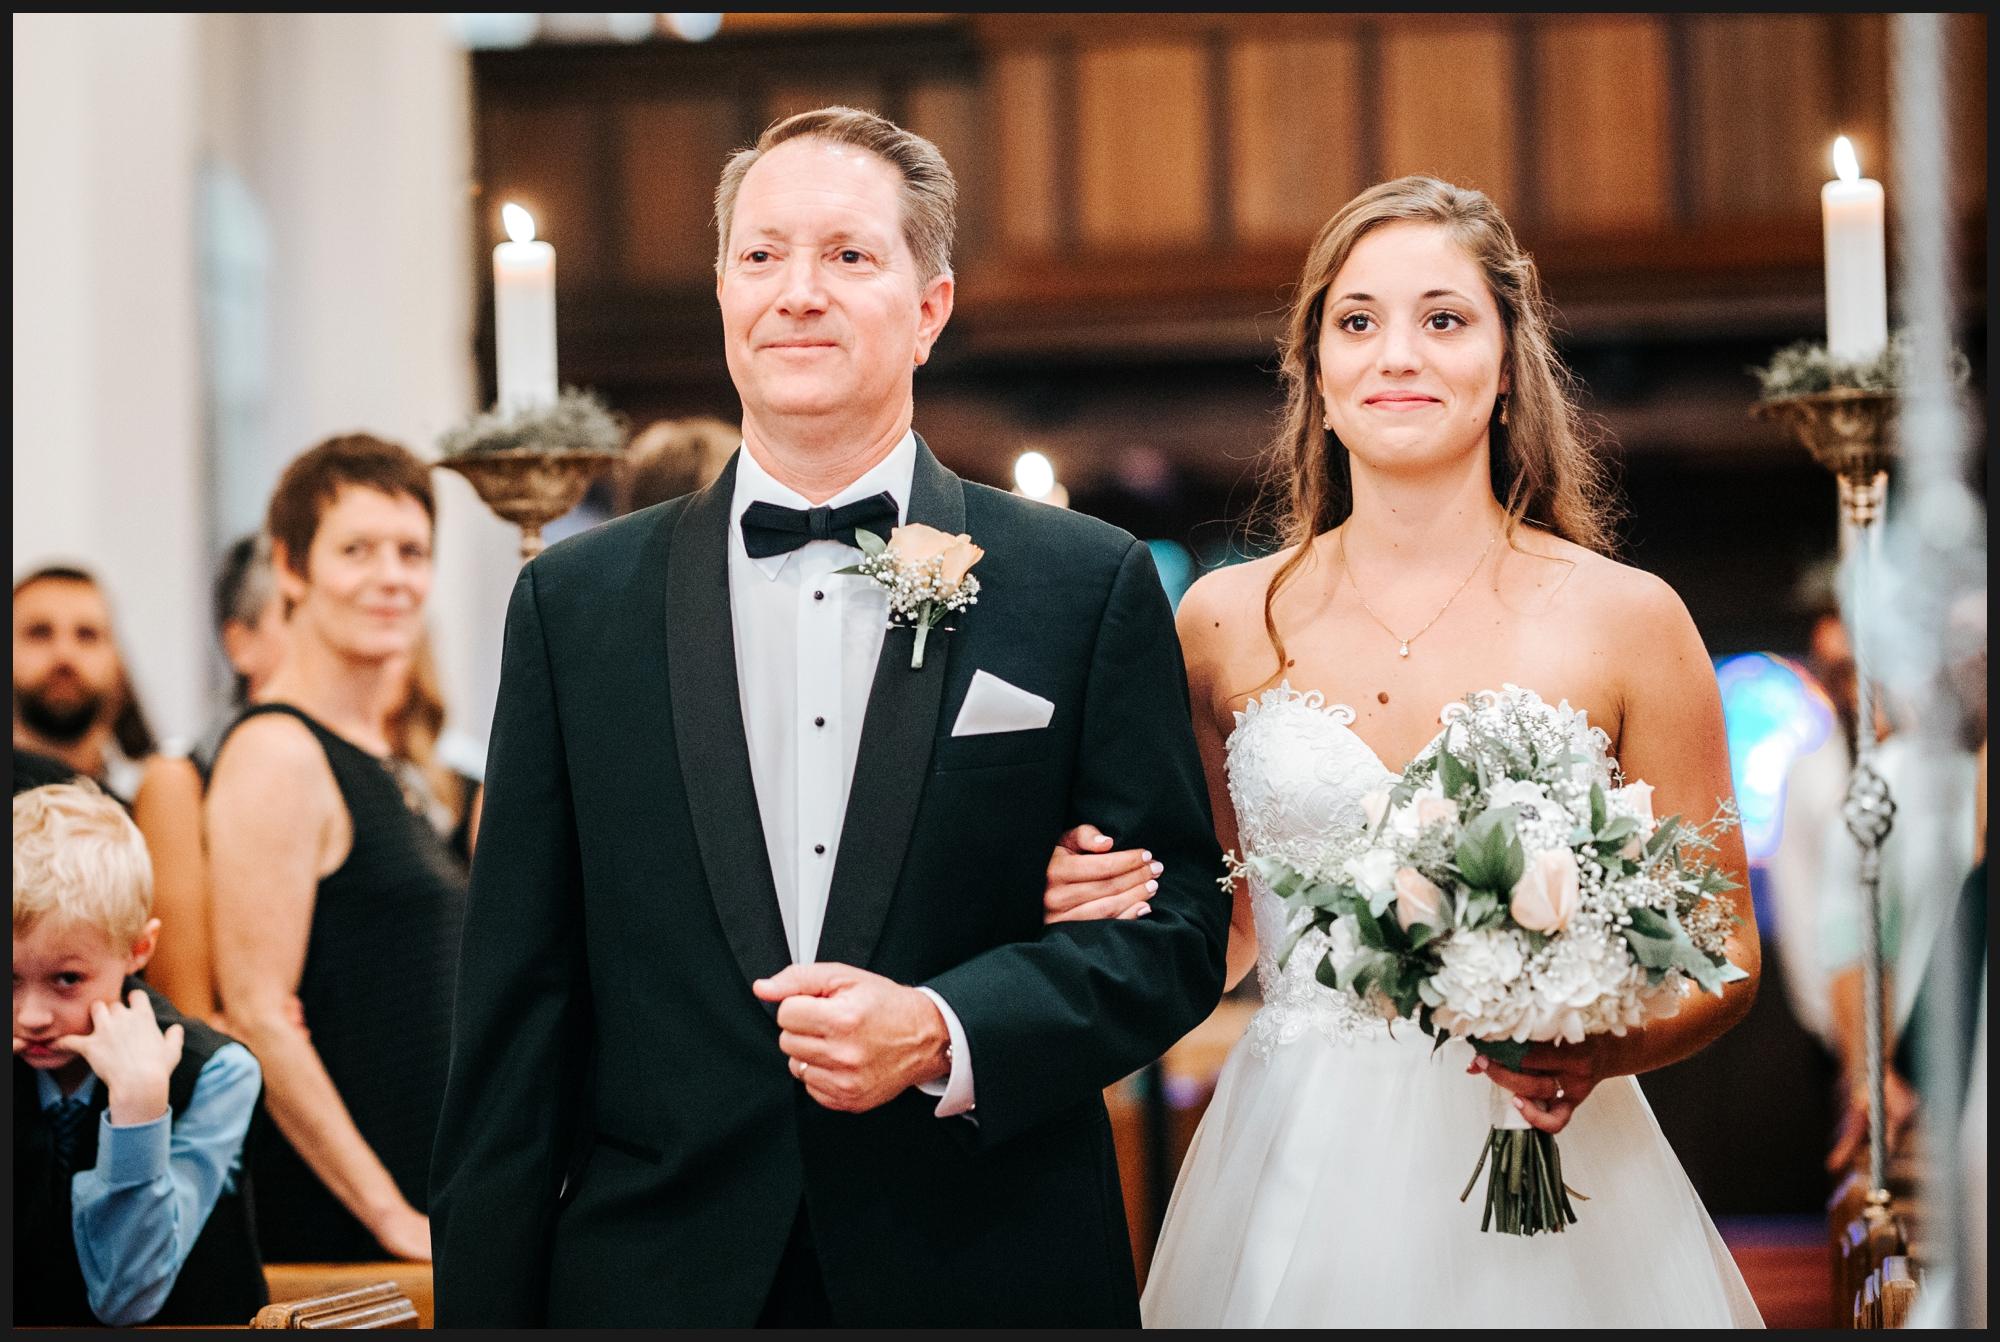 Orlando-Wedding-Photographer-destination-wedding-photographer-florida-wedding-photographer-bohemian-wedding-photographer_0056.jpg